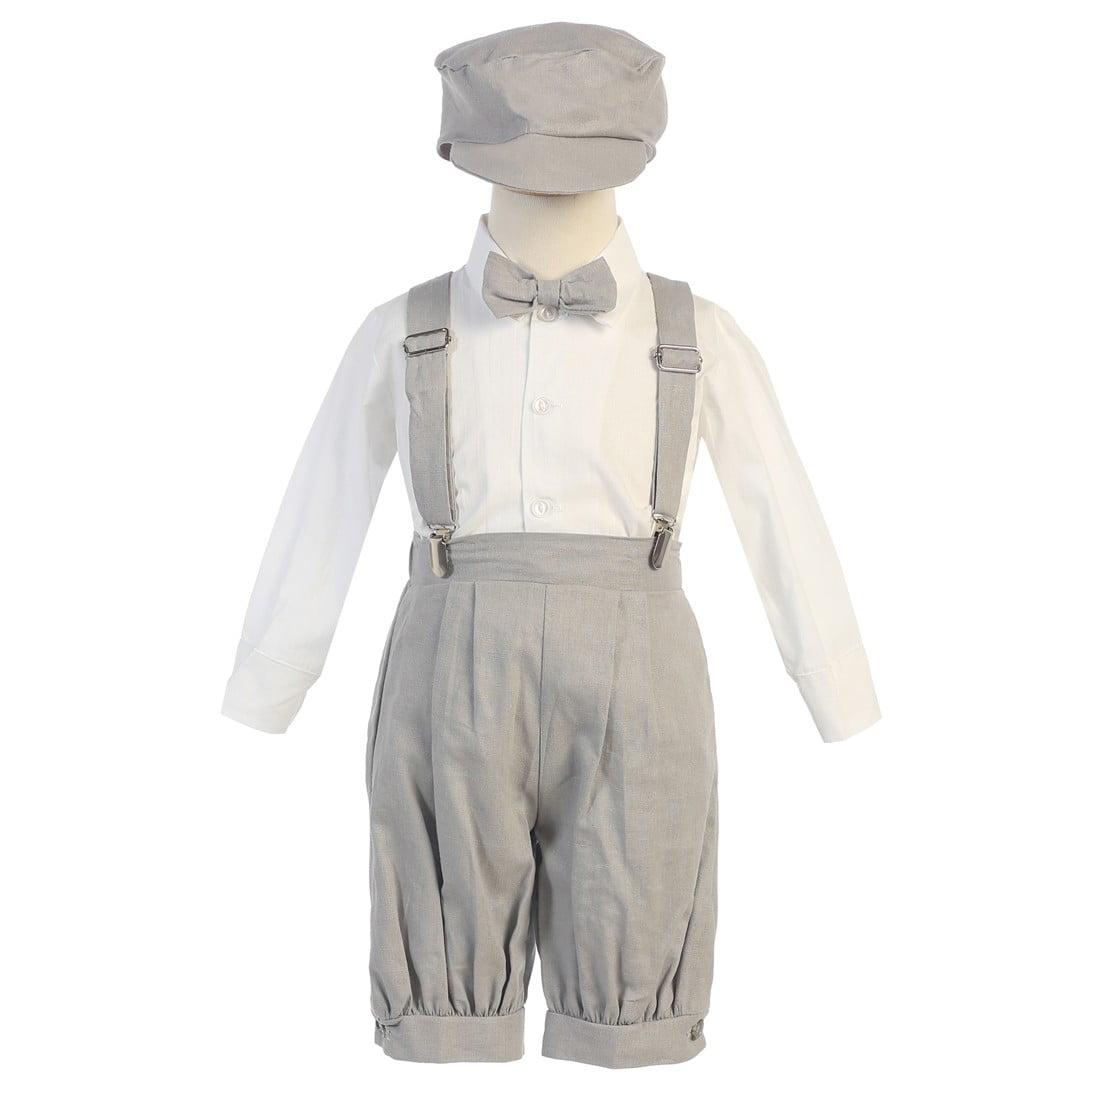 BABY BOYS Bow Tie Braces OUTFIT SET Romper Pants Hat Present Cool Love SMART